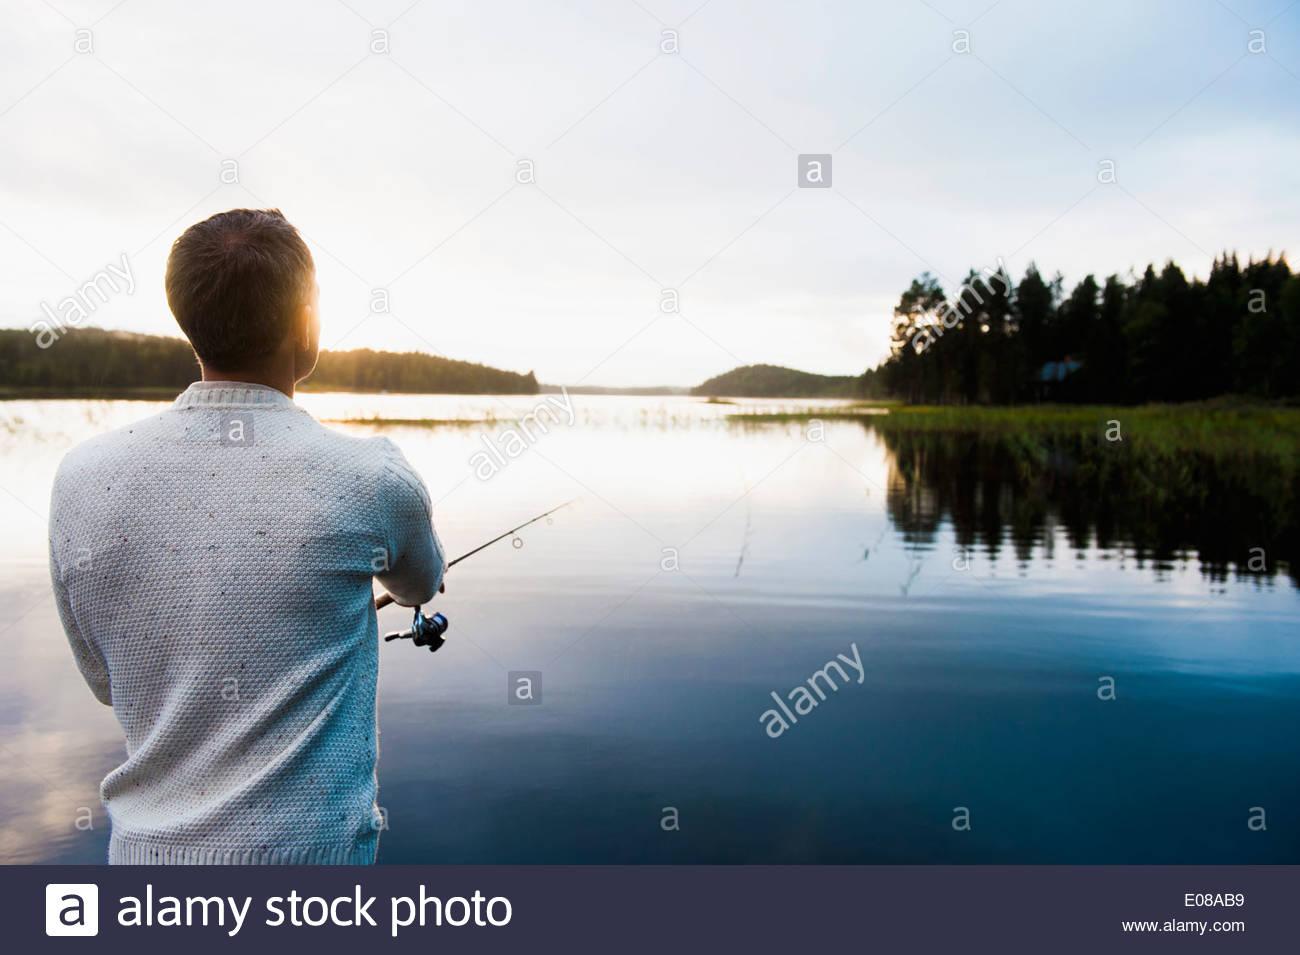 Rear view of man fishing at lake - Stock Image